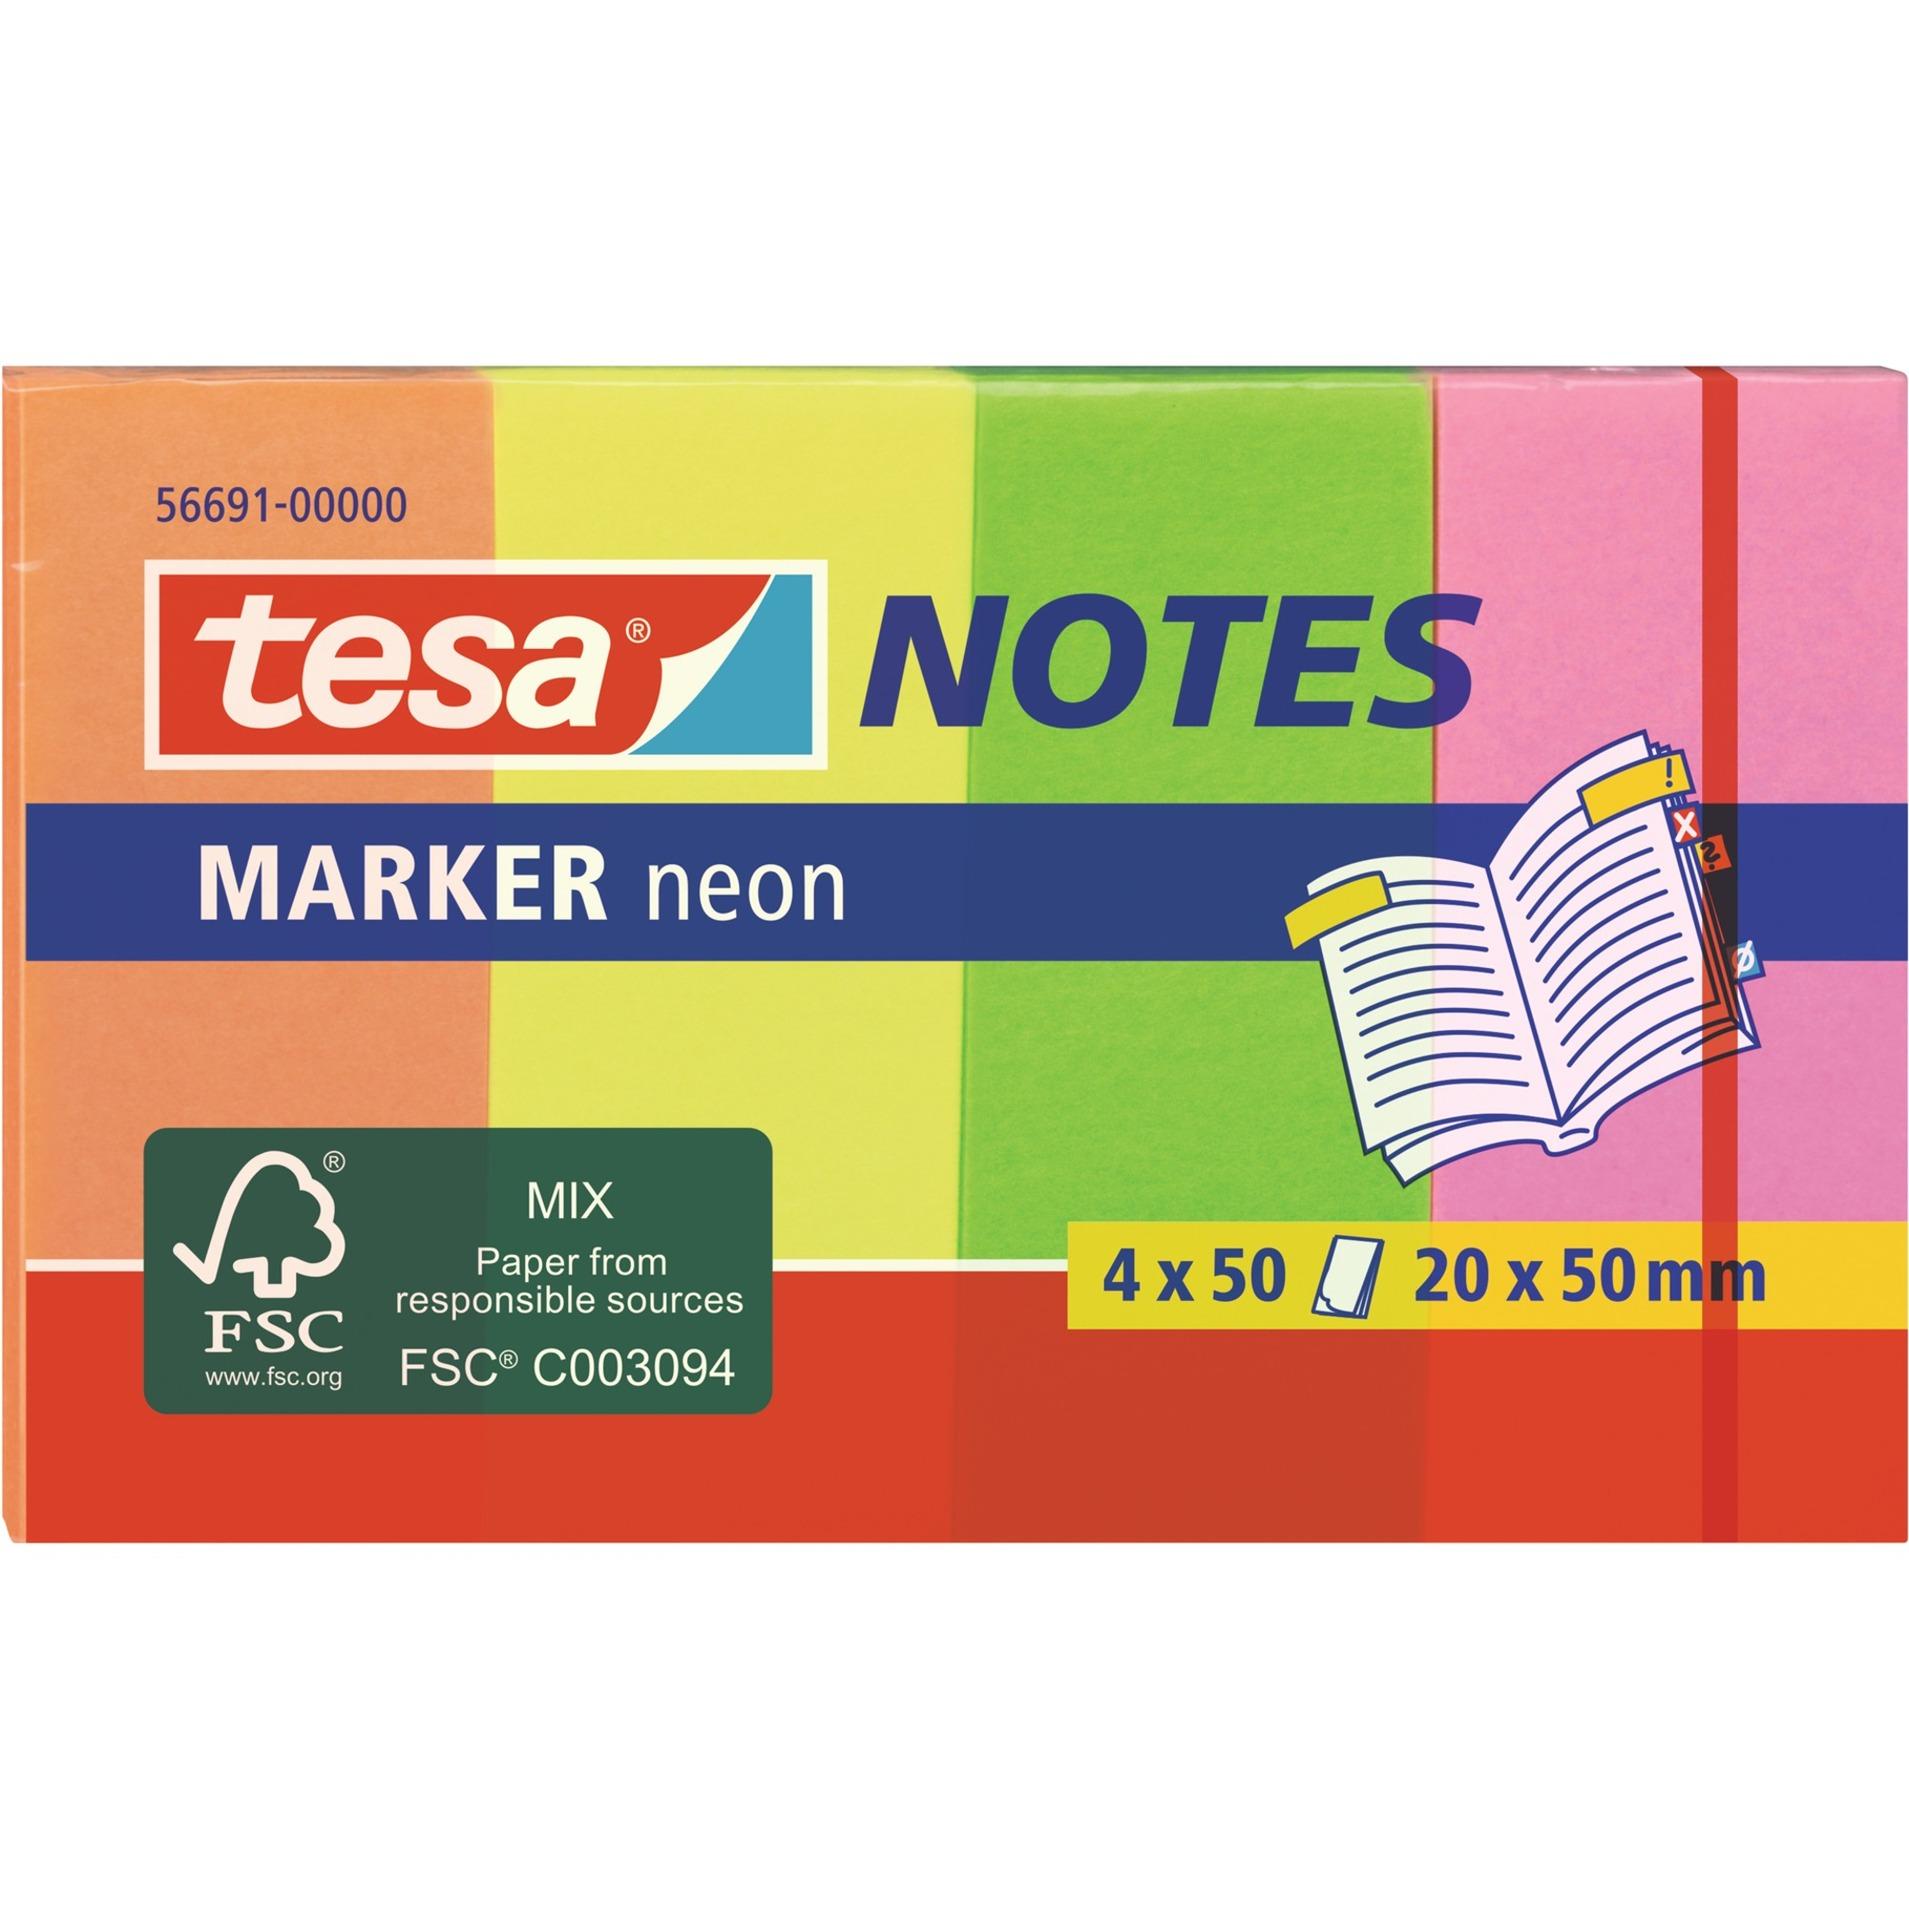 Image of Marker Notes neon, 4 x 50 Blatt, Aufkleber